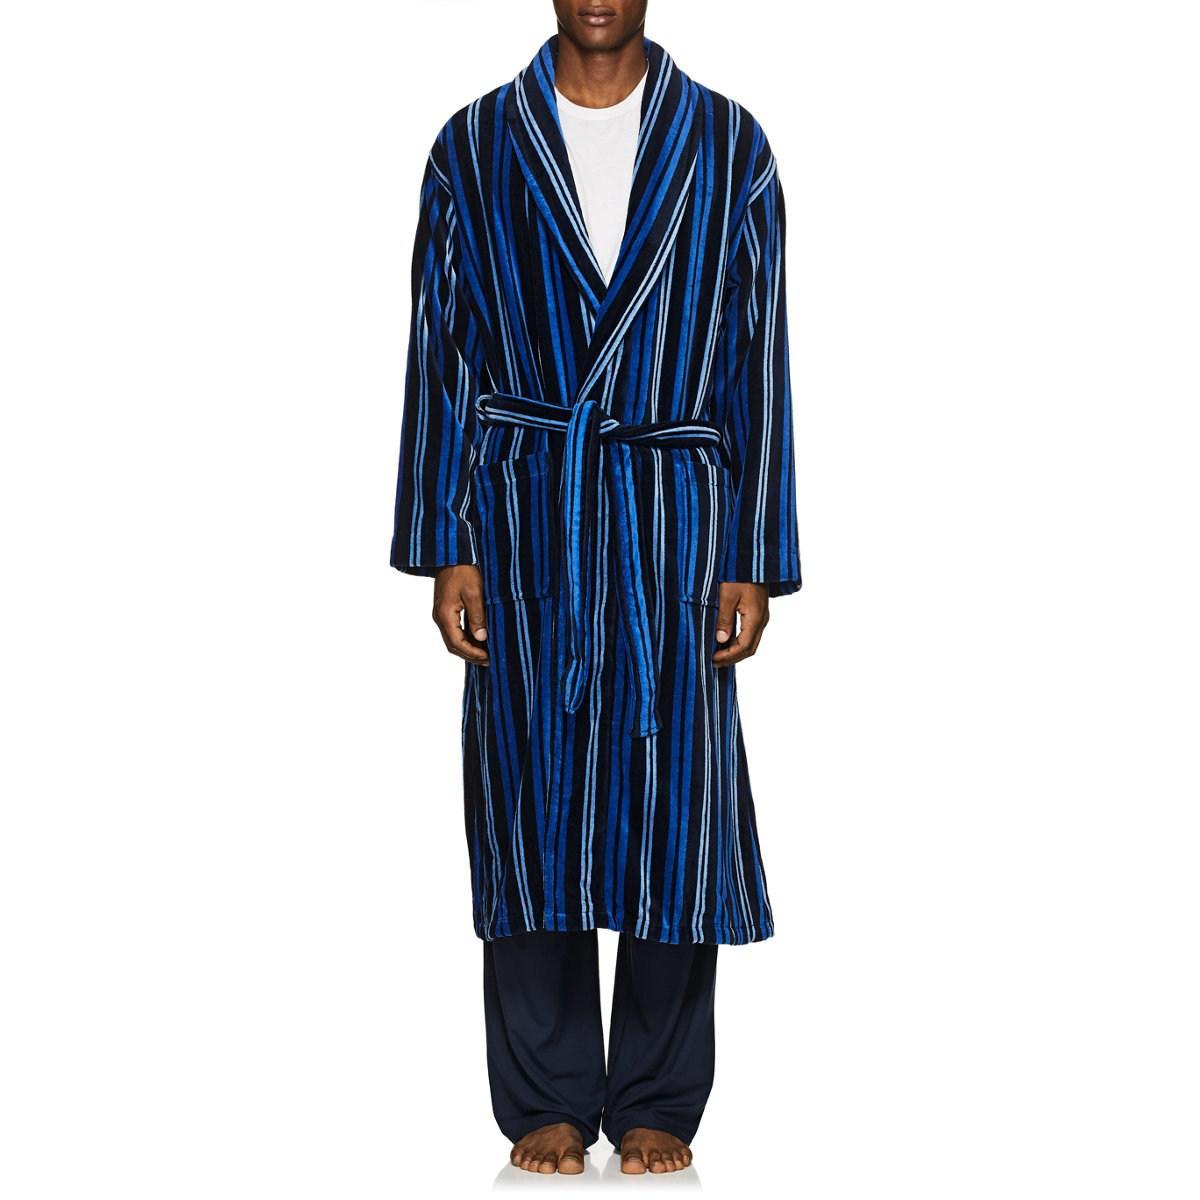 40c5c7ce28 Lyst - Derek Rose Aston Striped Cotton Velour Robe in Blue for Men